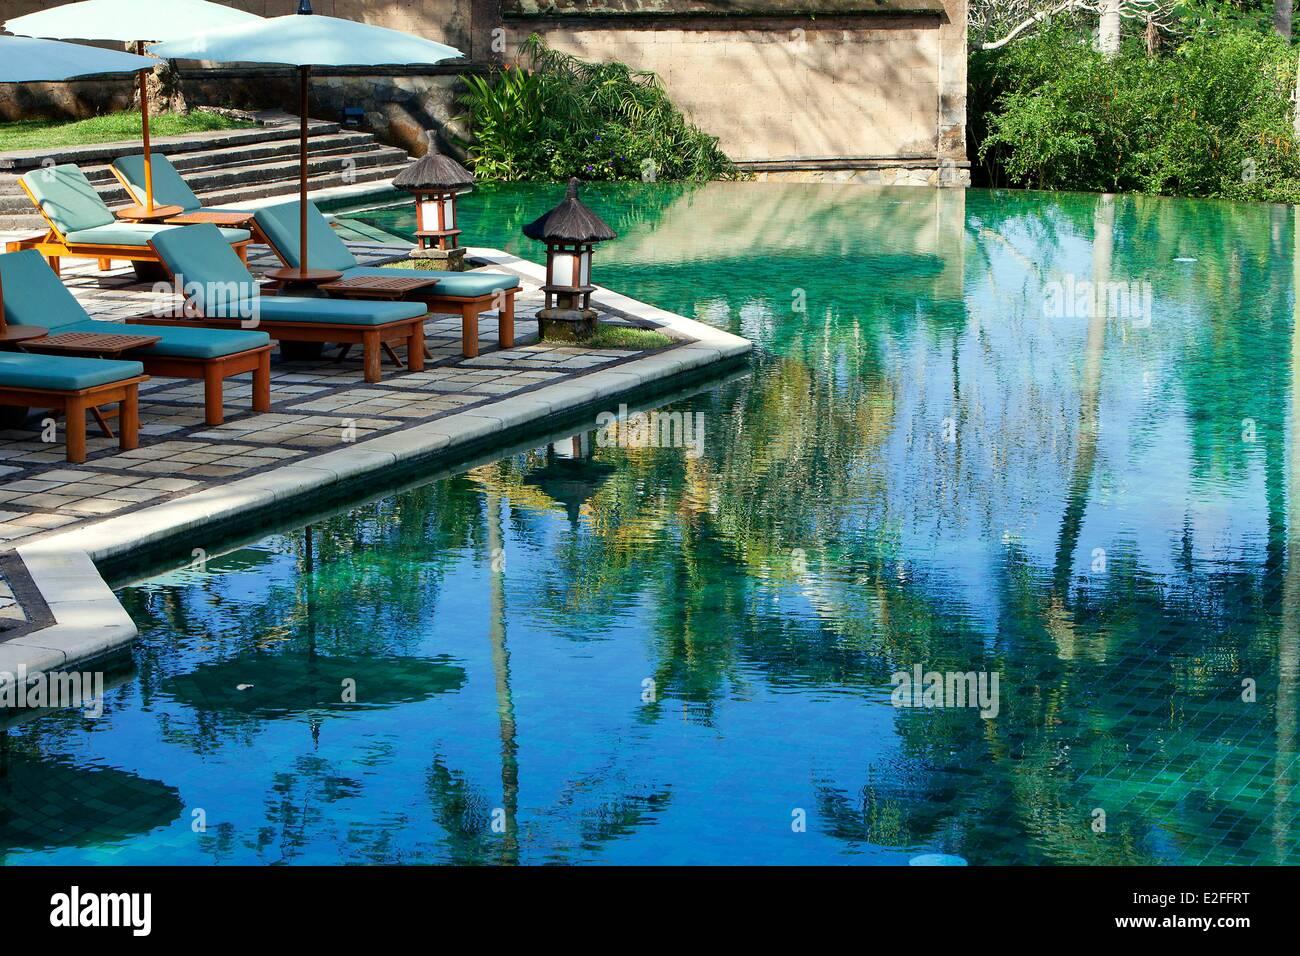 Indonesia, Bali, Ubud, Hotel Amandari, pool - Stock Image